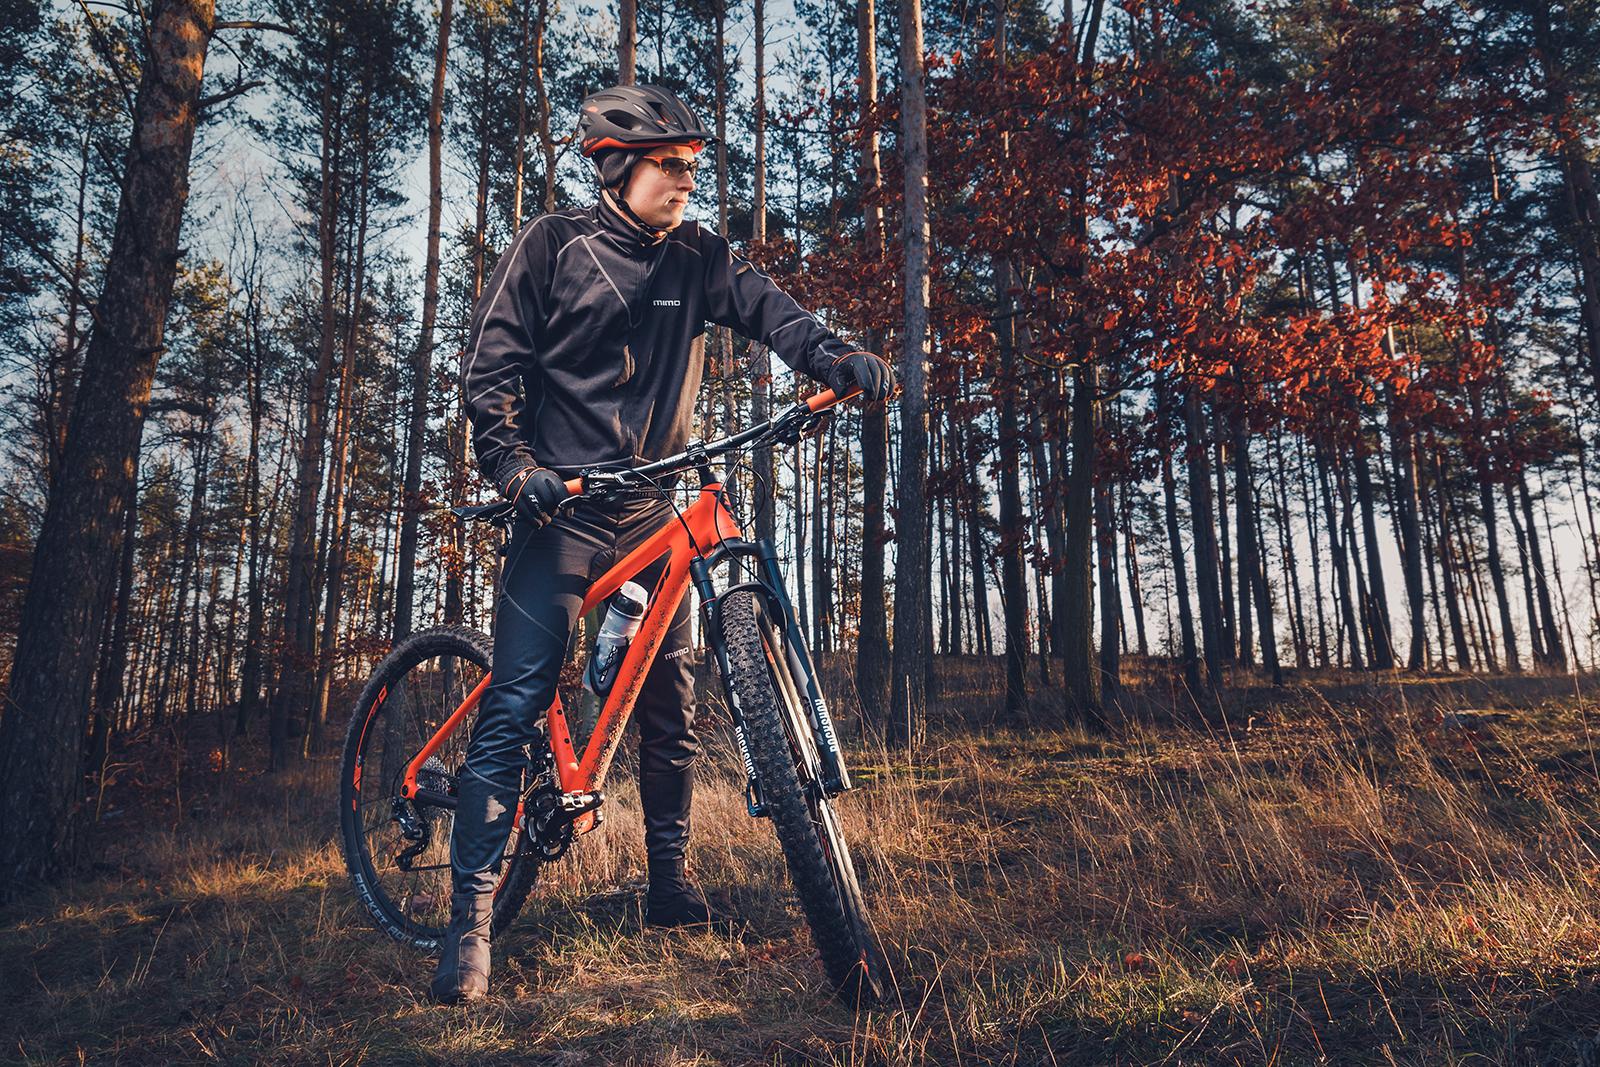 23-rower